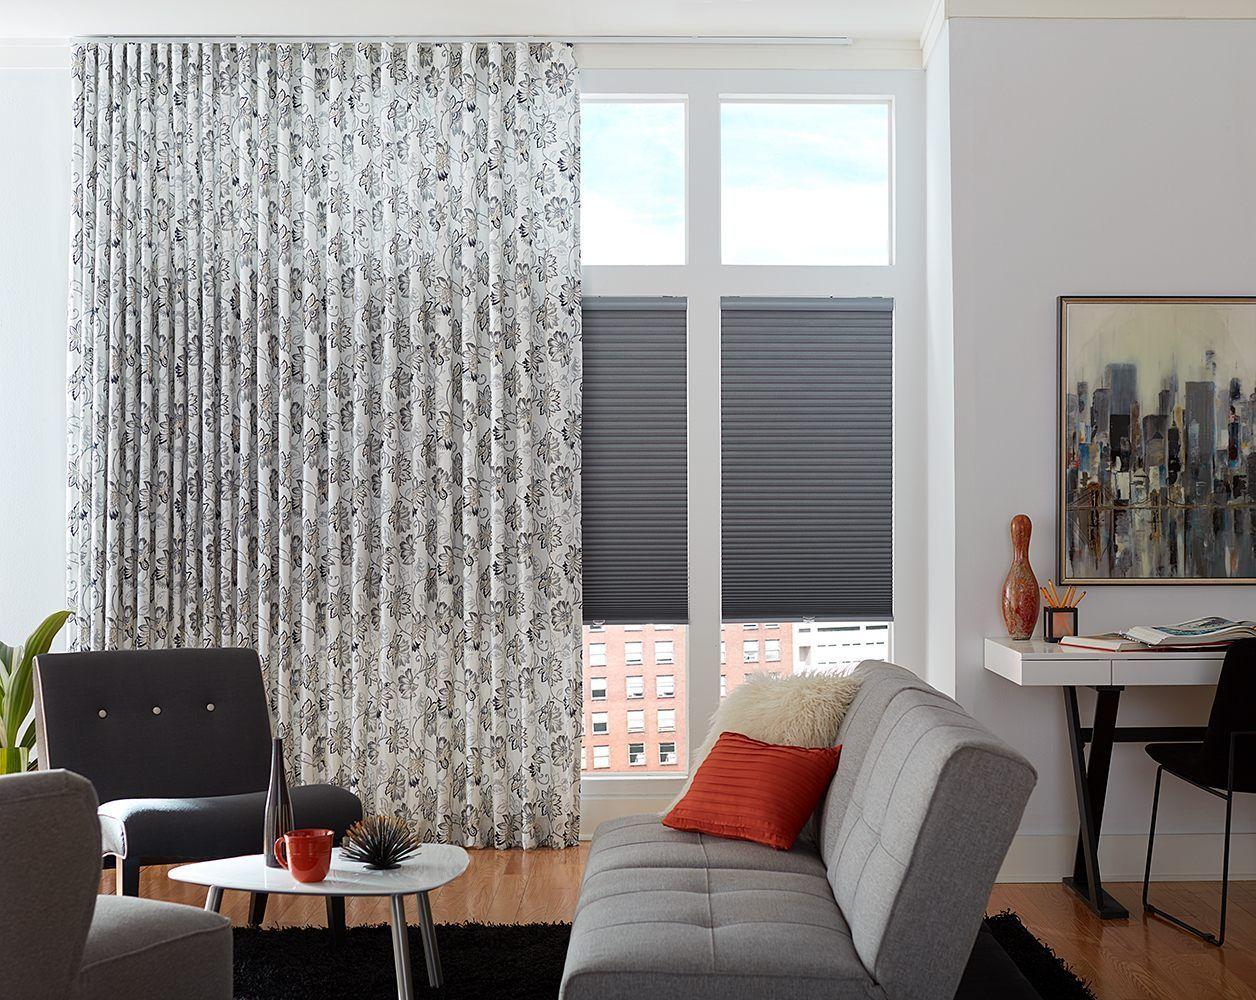 The Best Vertical Blinds Alternatives For Sliding Glass Doors Sliding Glass Door Custom Curtains Glass Door